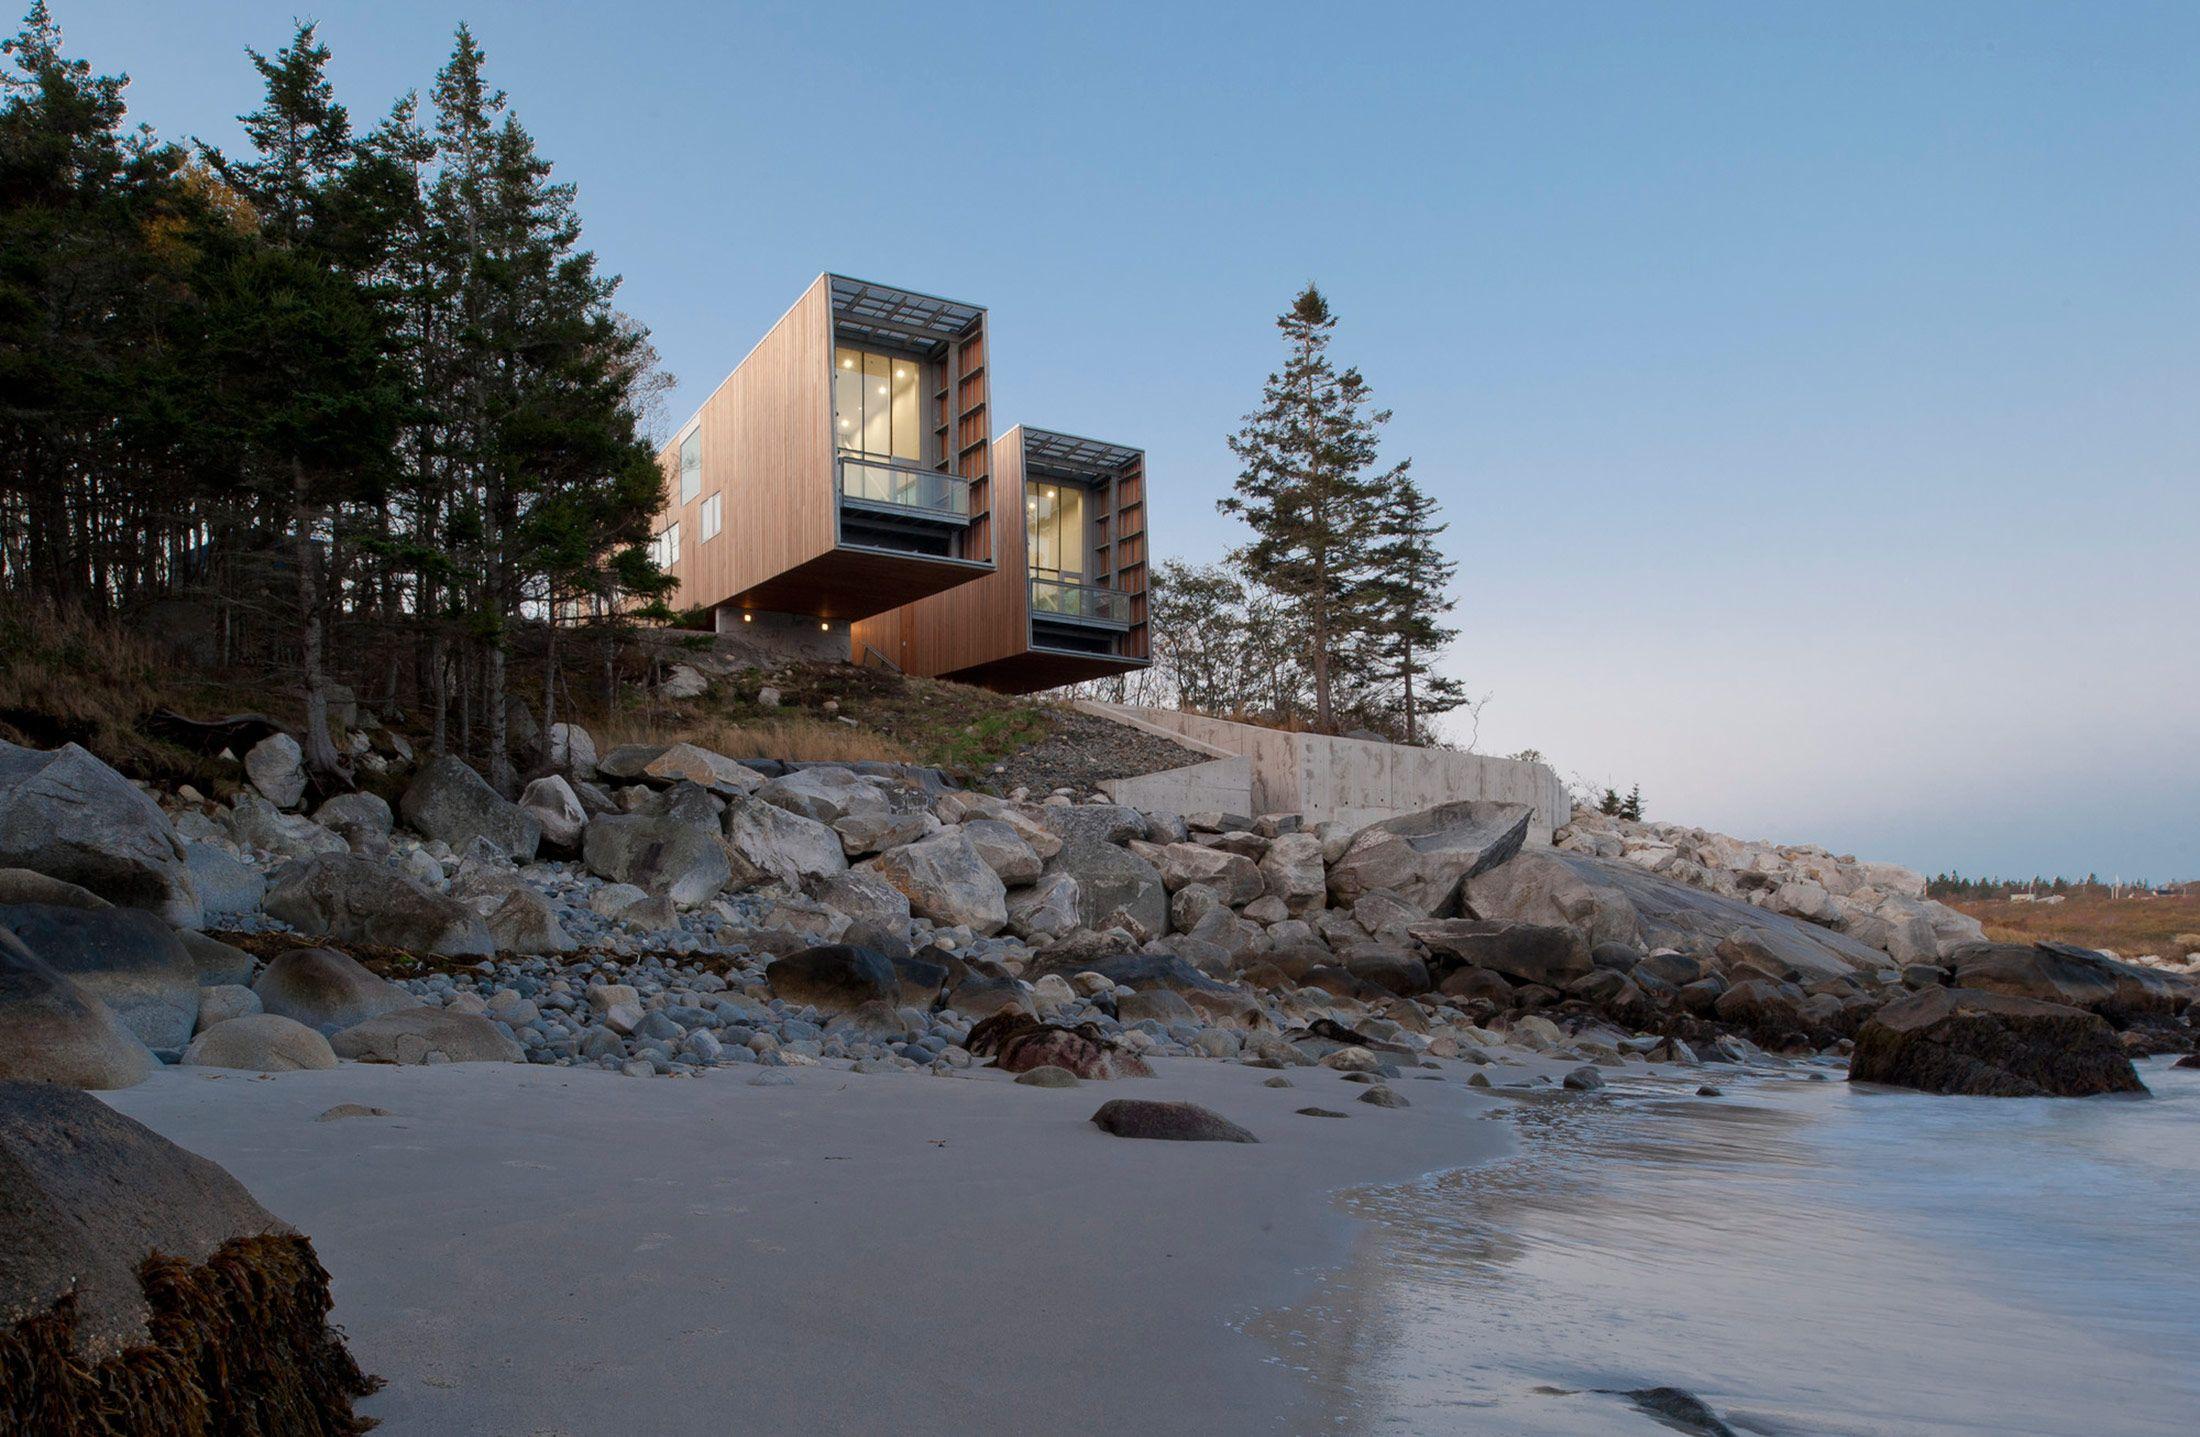 The Two Hulls House In Nova Scotia, Canada